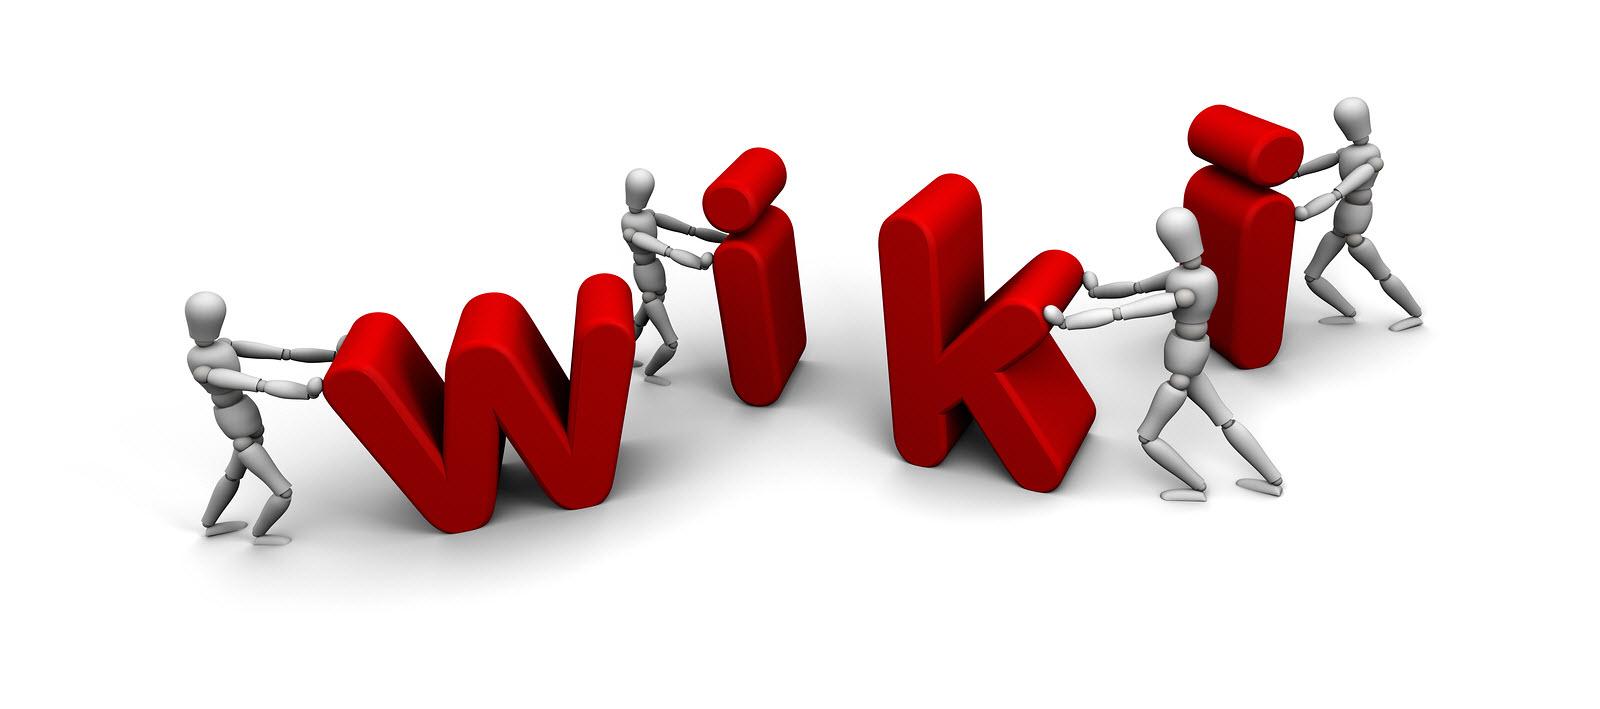 You are currently viewing Τί ειναι το Wiki και ποιός ο ρόλος του στην εκπαίδευση